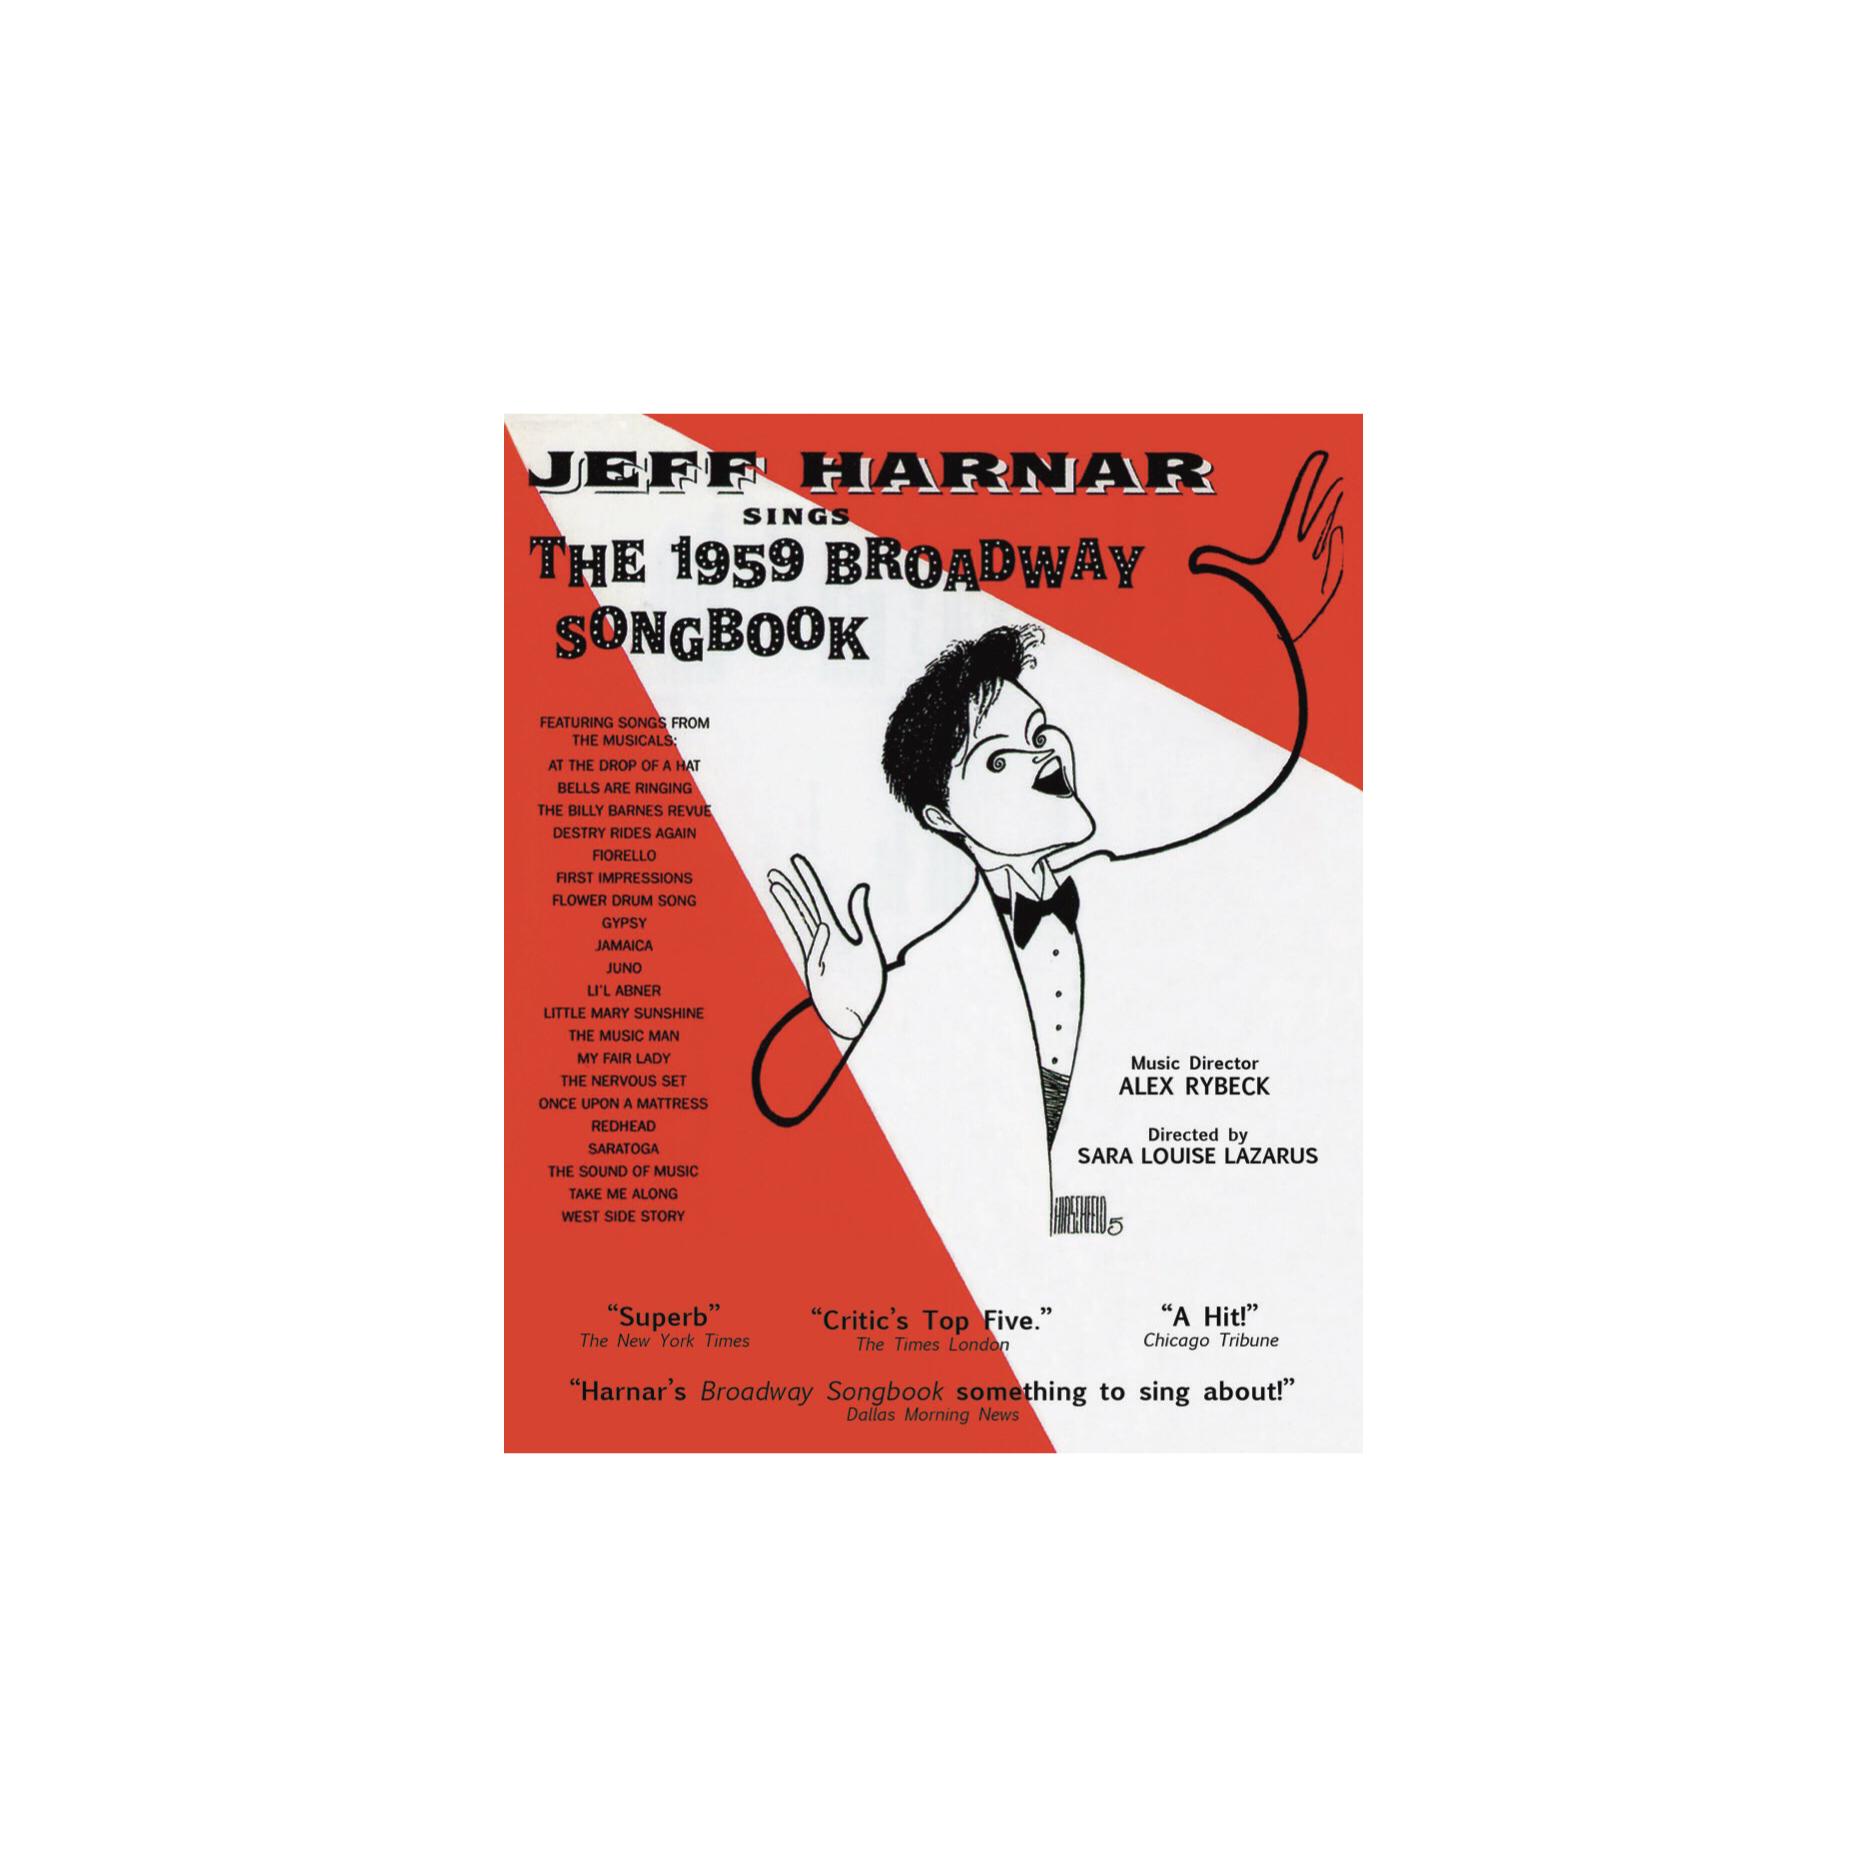 1959 BROADWAY SOUND BOOK